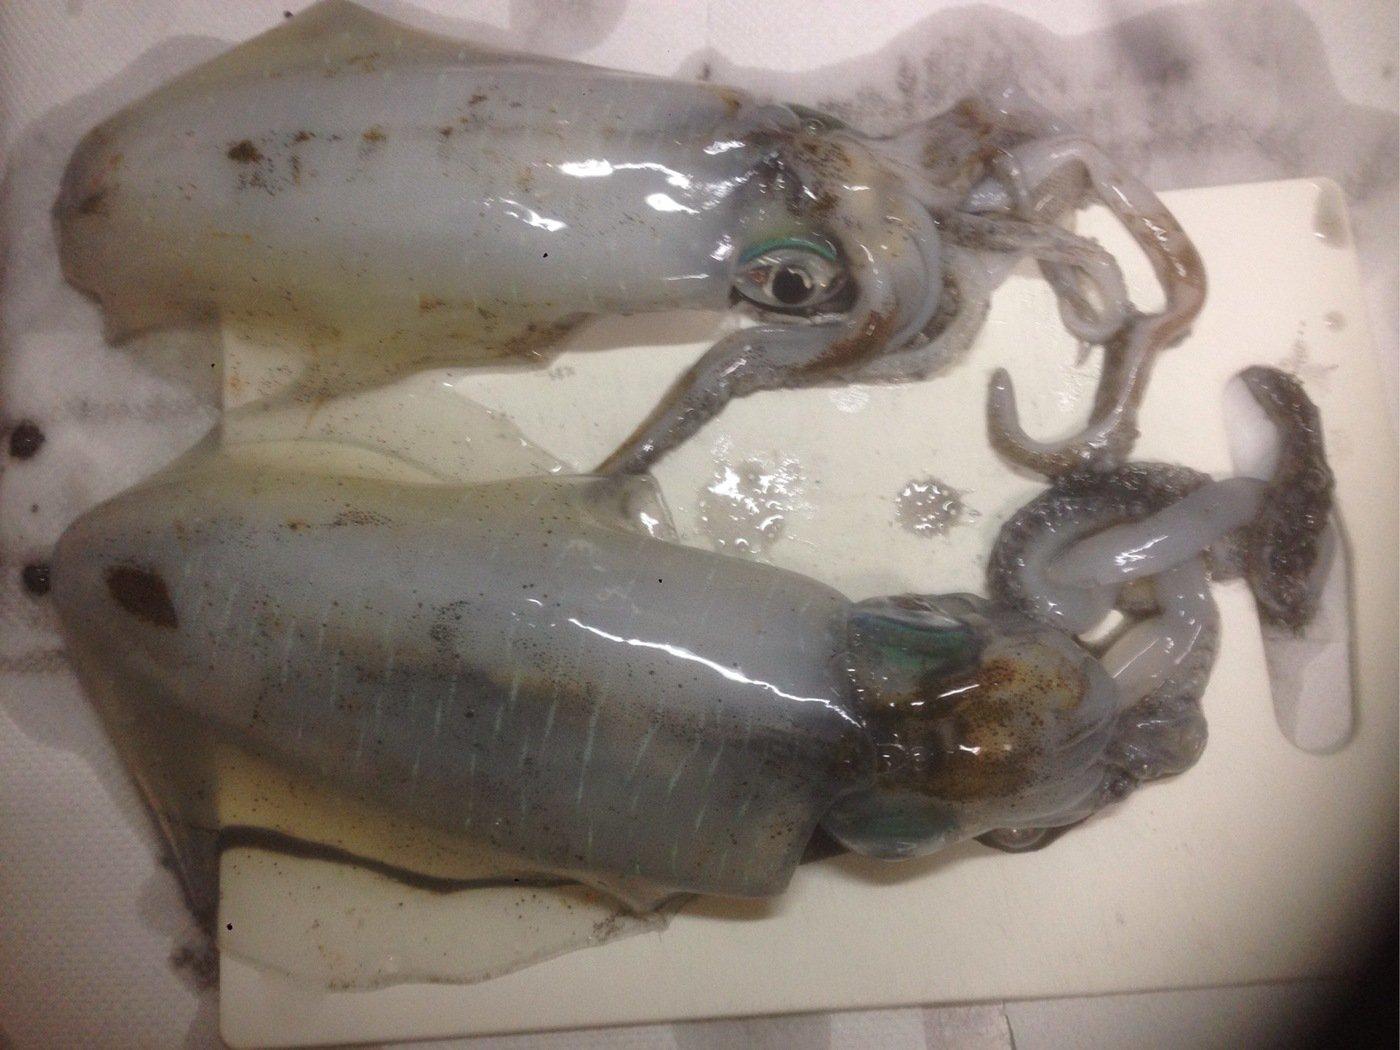 Ñøbüさんの投稿画像,写っている魚はアオリイカ